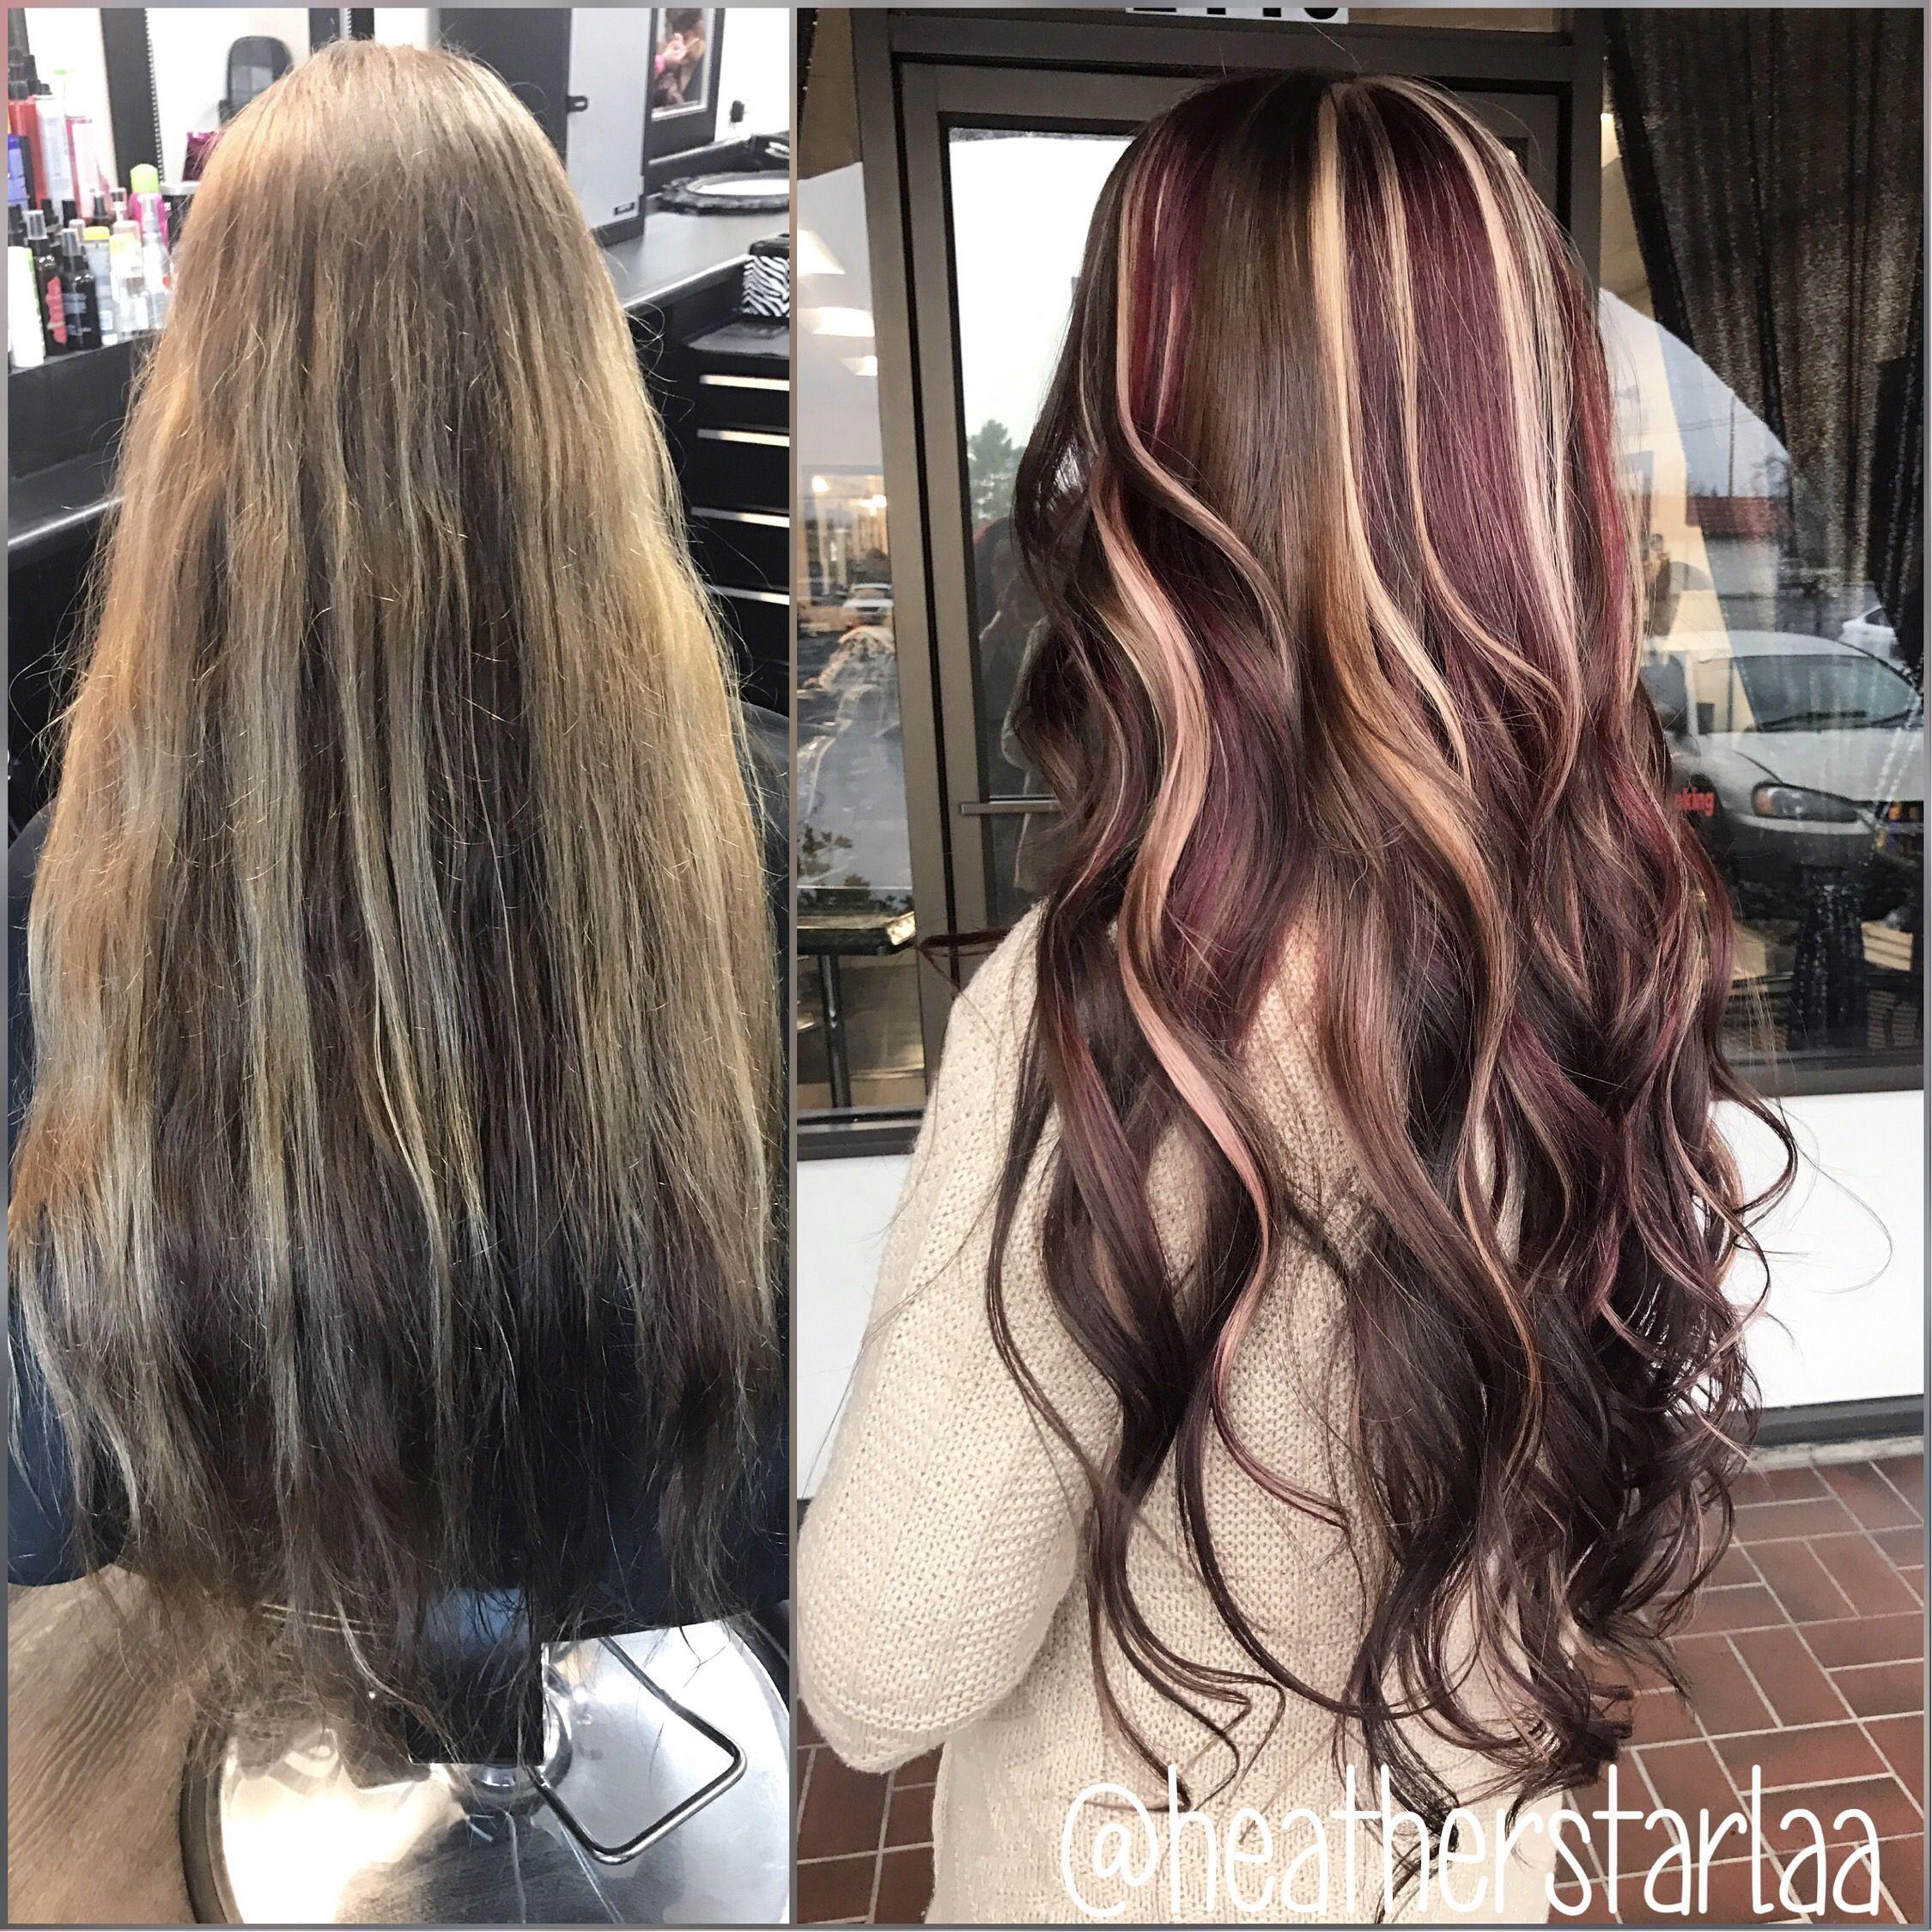 Long hair. Curled hair. Chocolate brown hair. Red highlights ...